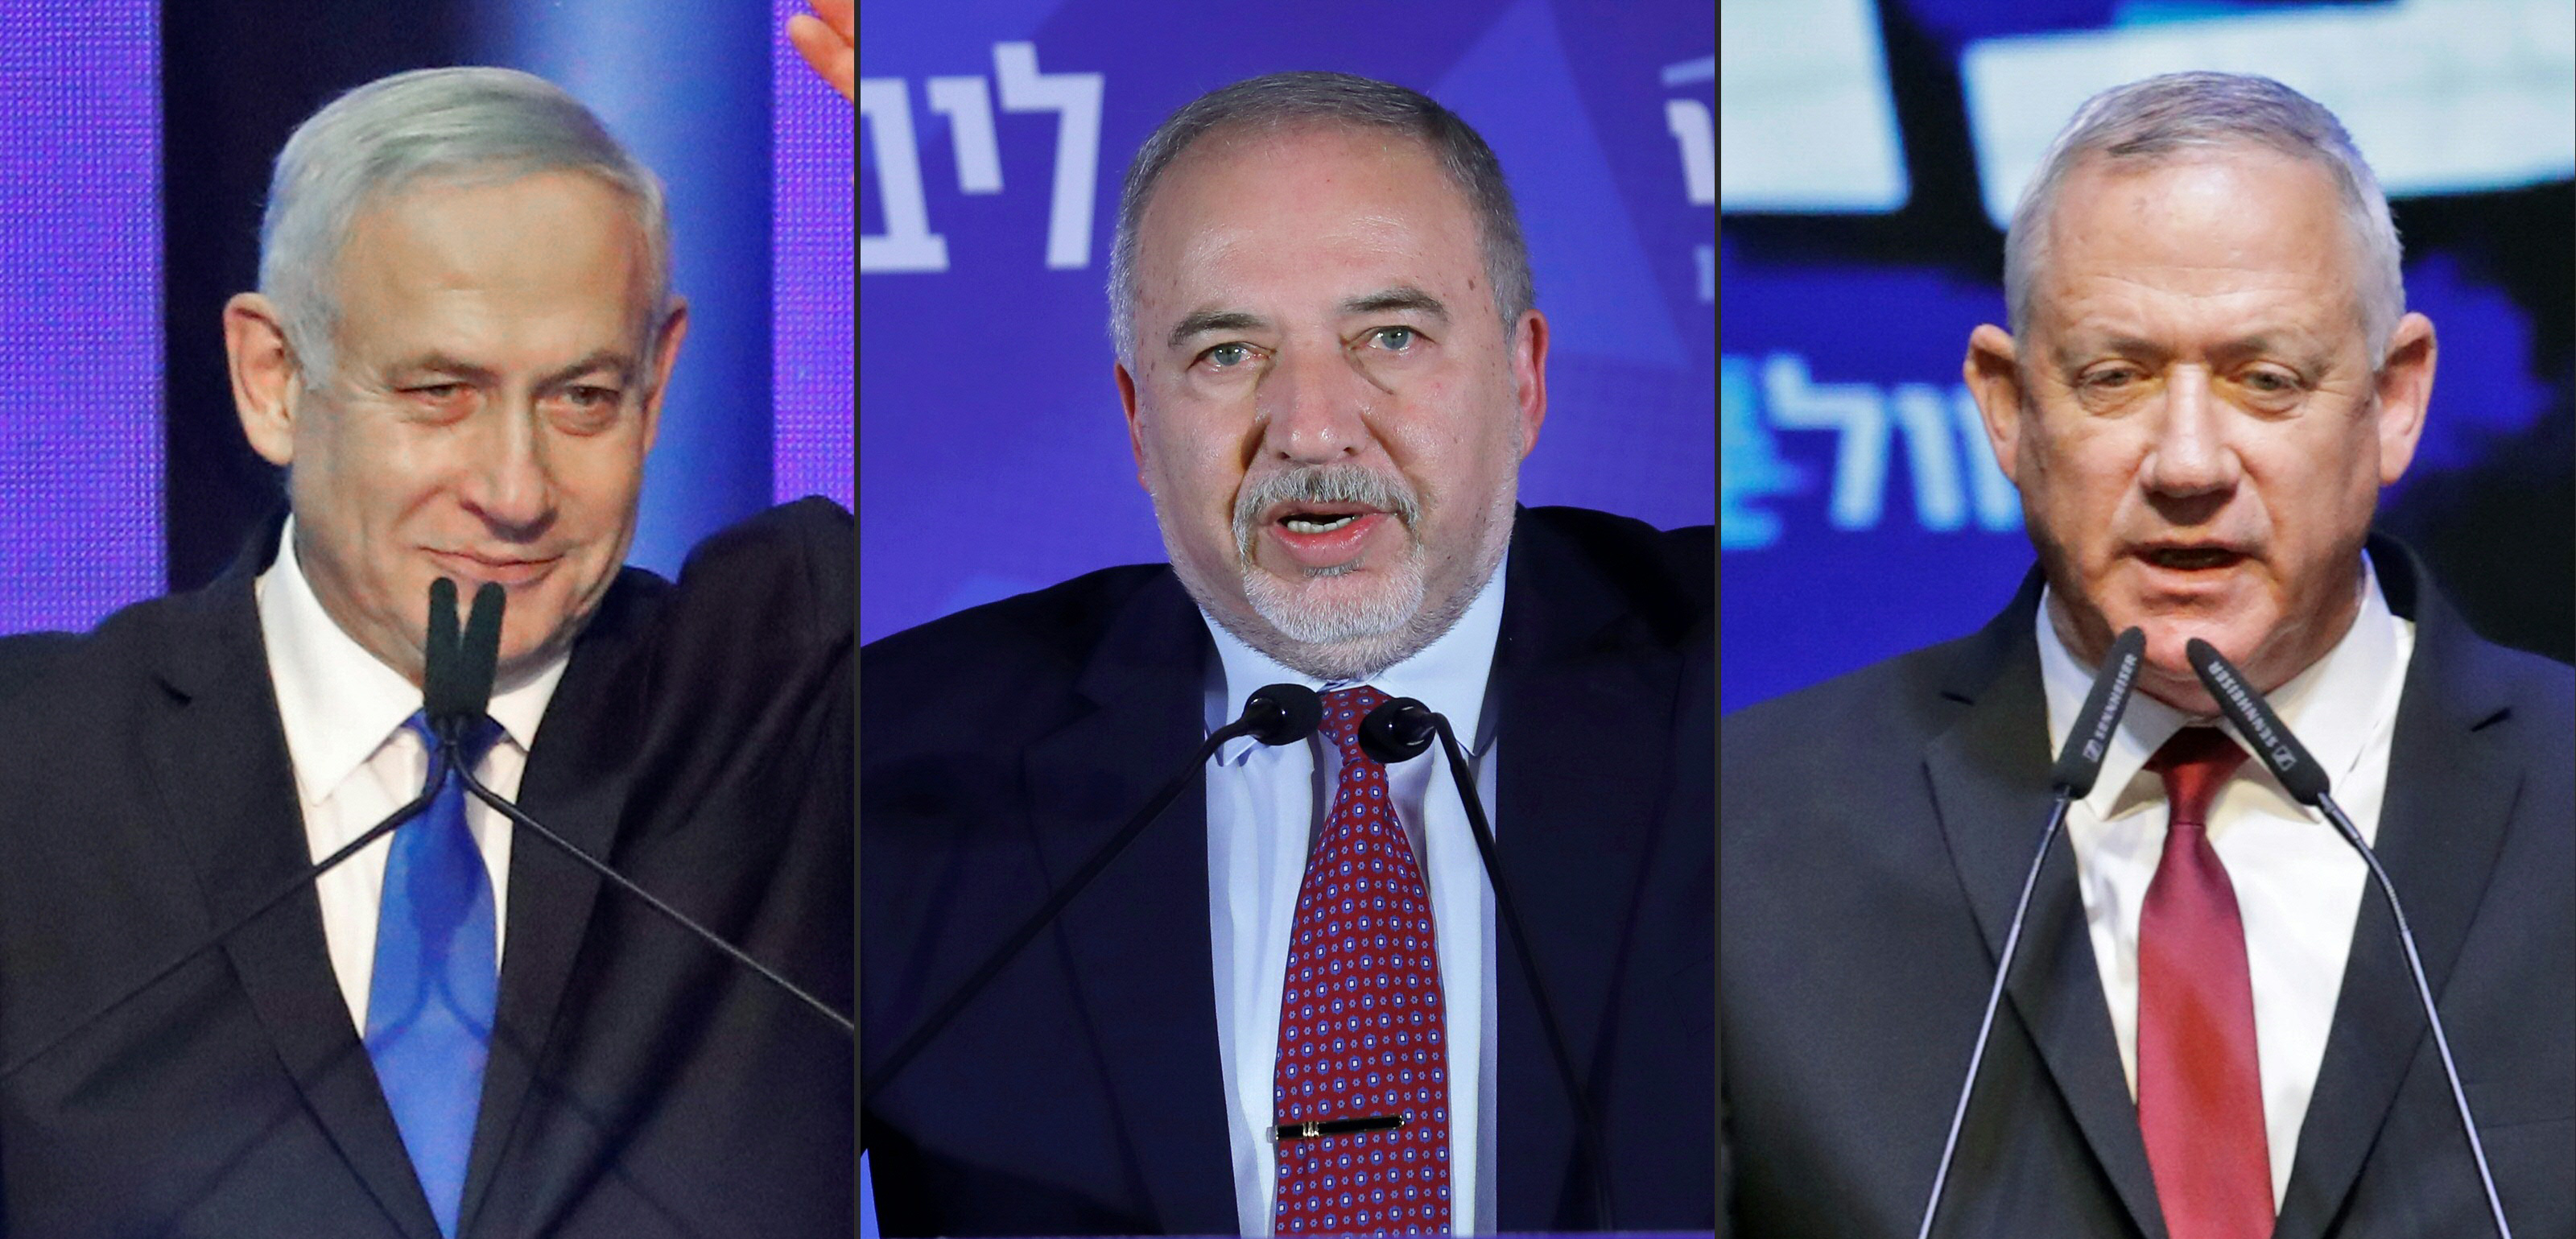 Israeli Prime Minister Benjamin Netanyahu, Avigdor Lieberman, leader of the Israeli nationalist Yisrael Beiteinu party and retired General Benny Gantz (AFP)